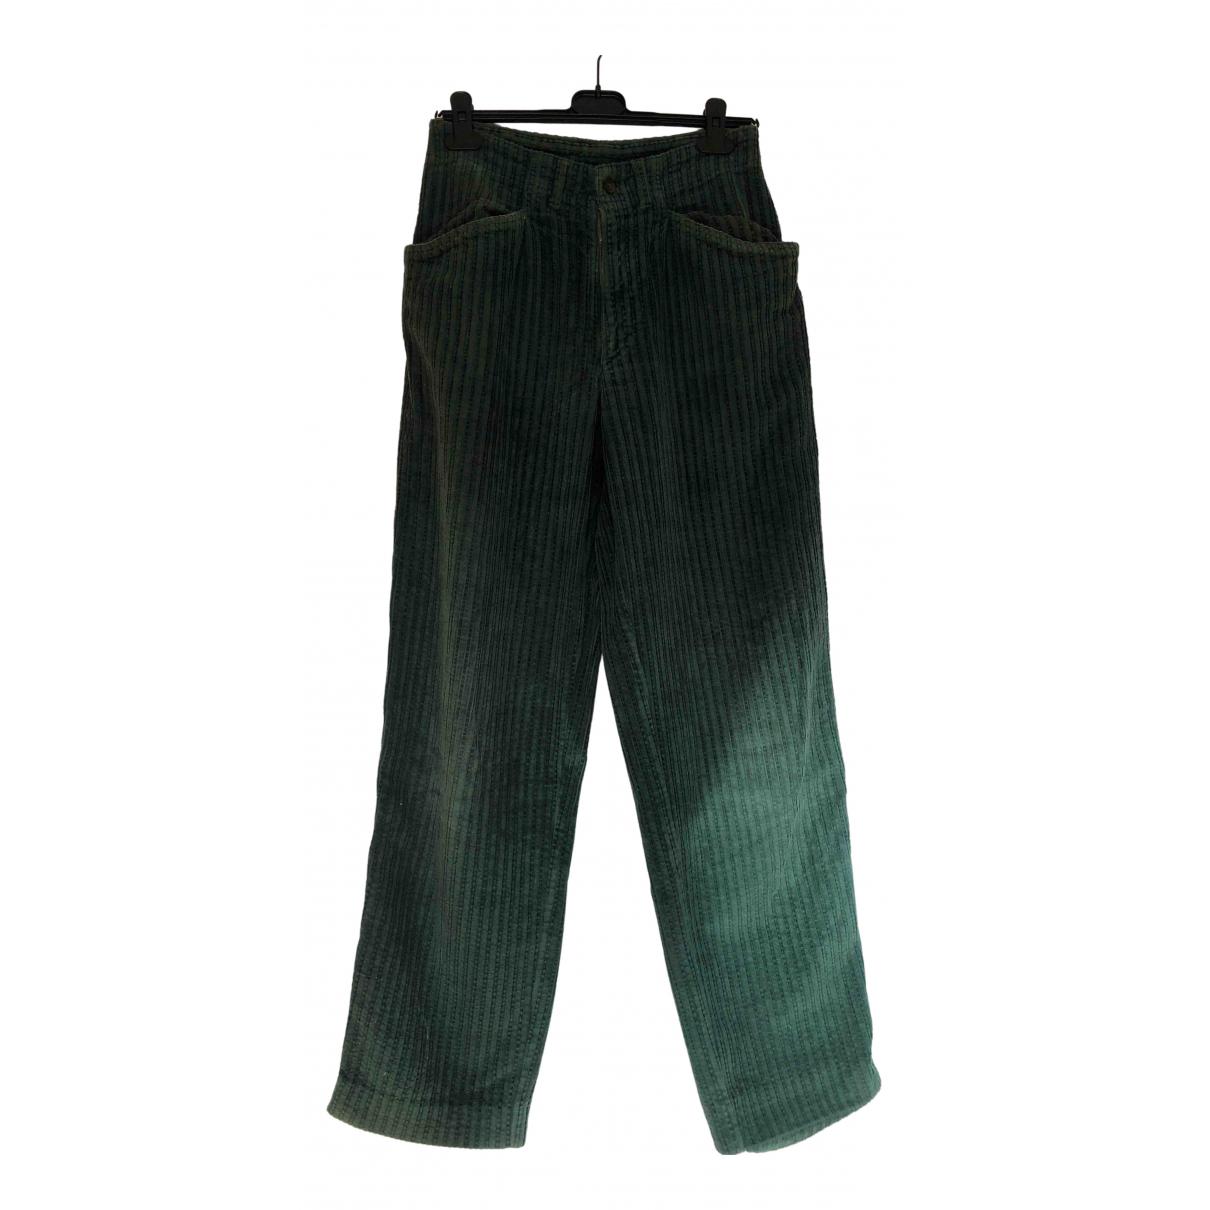 Benetton - Pantalon   pour homme en velours - vert